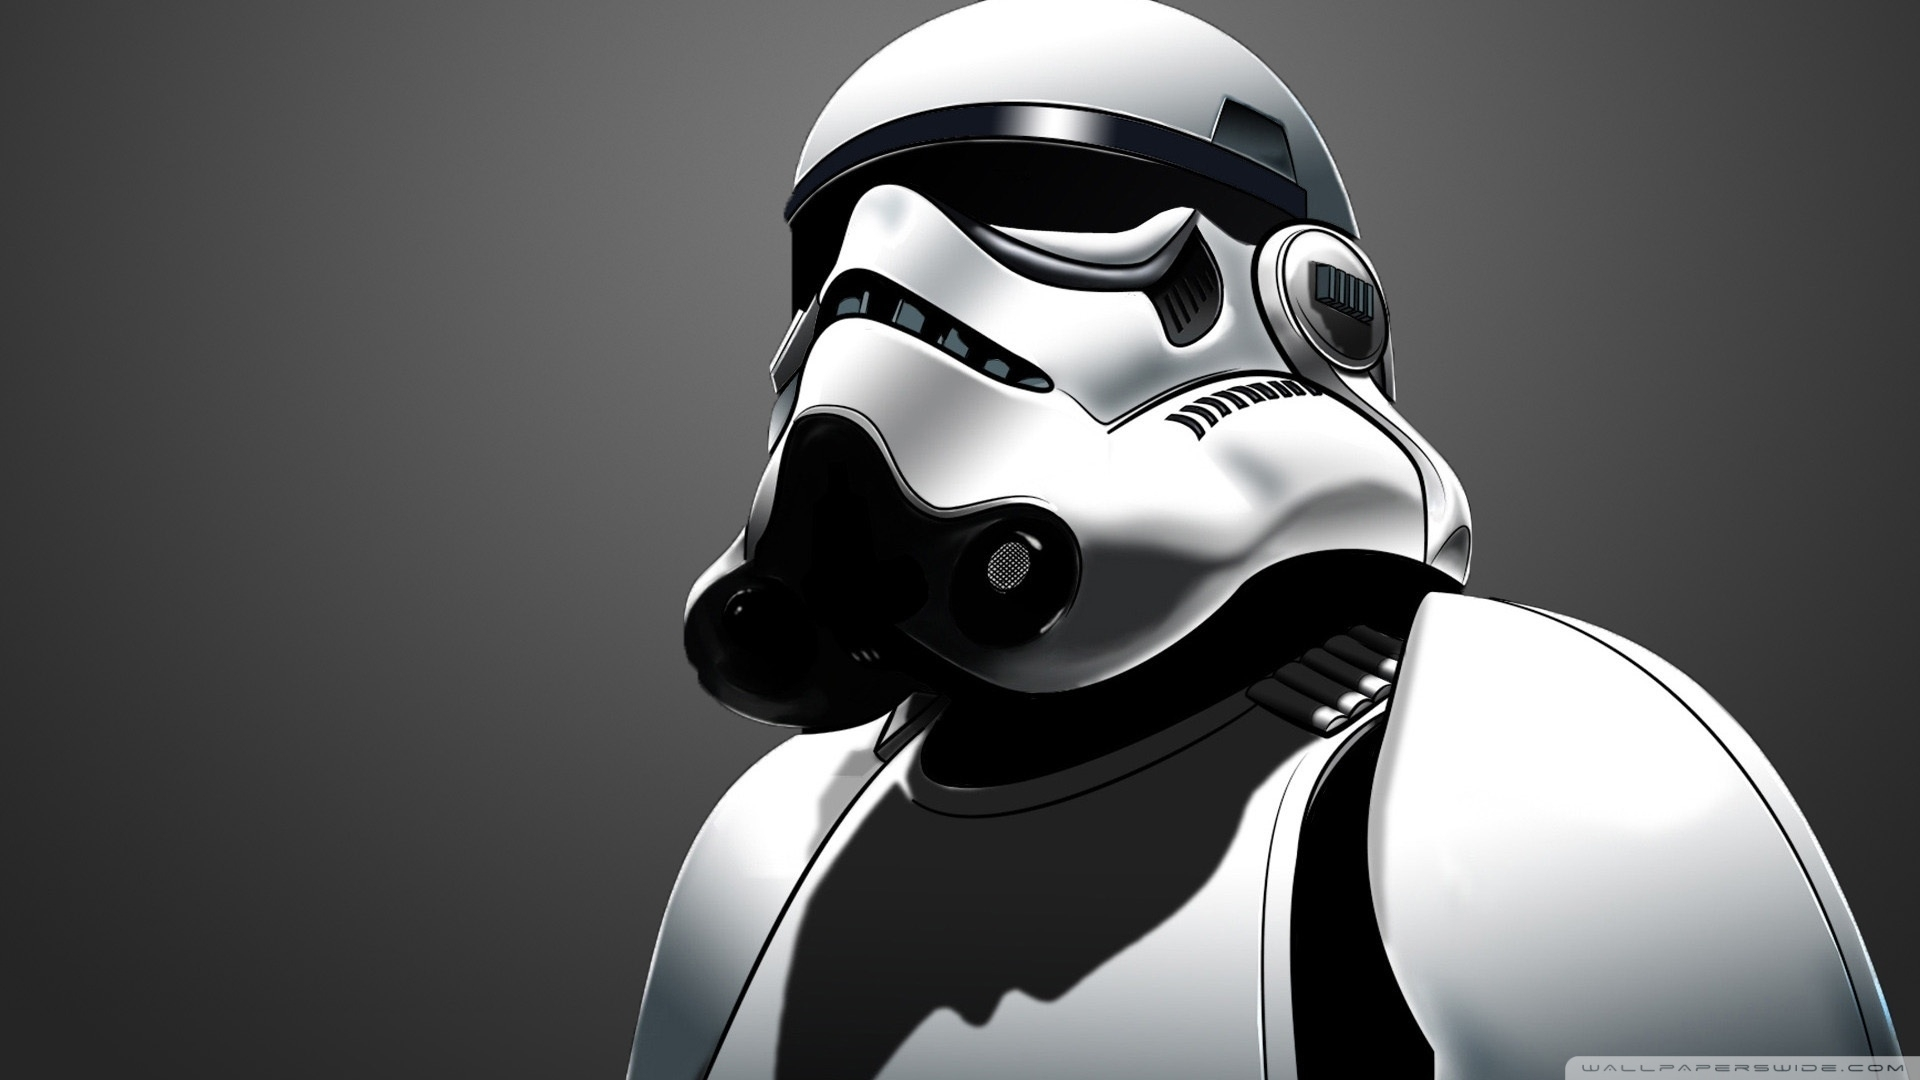 10 Top Star Wars Stormtrooper Wallpaper Full Hd 1920 1080 For Pc